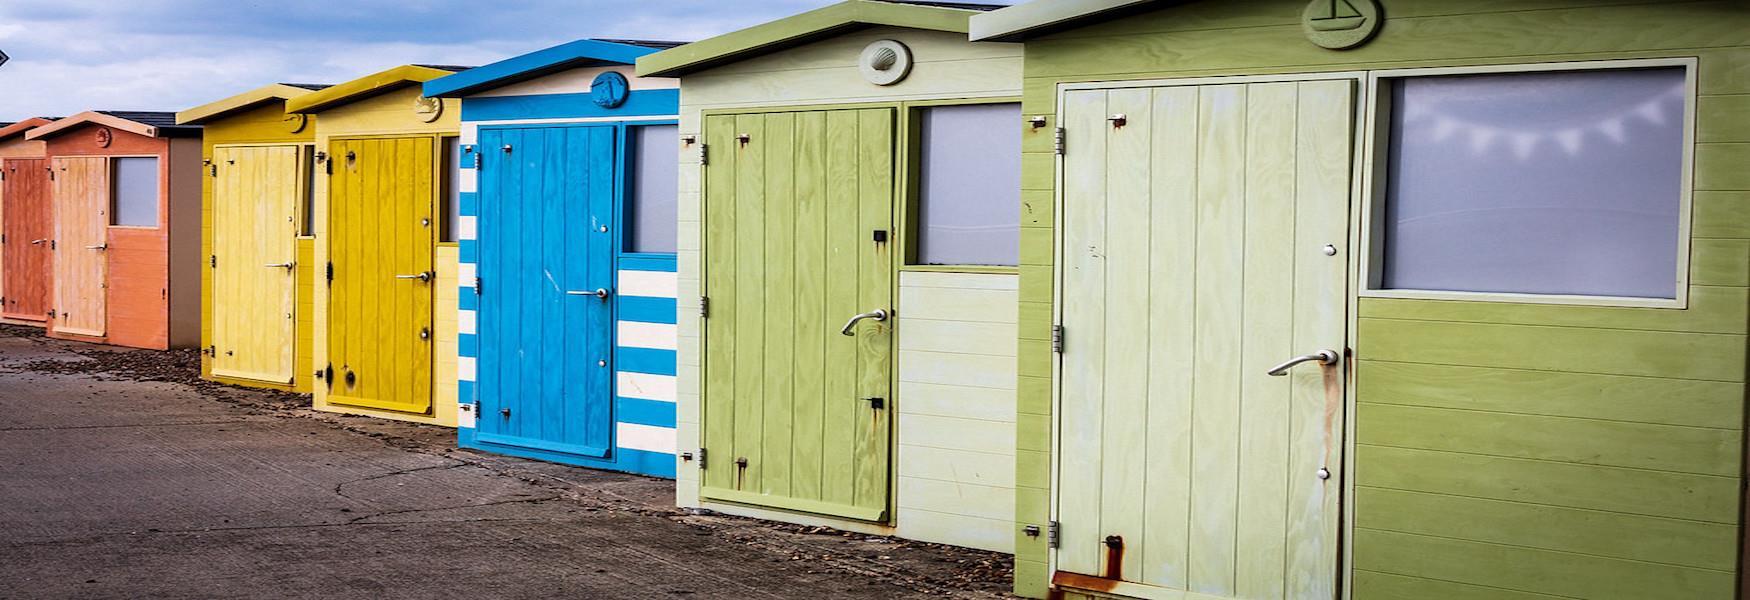 Beach Huts at Seaford Beach - Nigel French